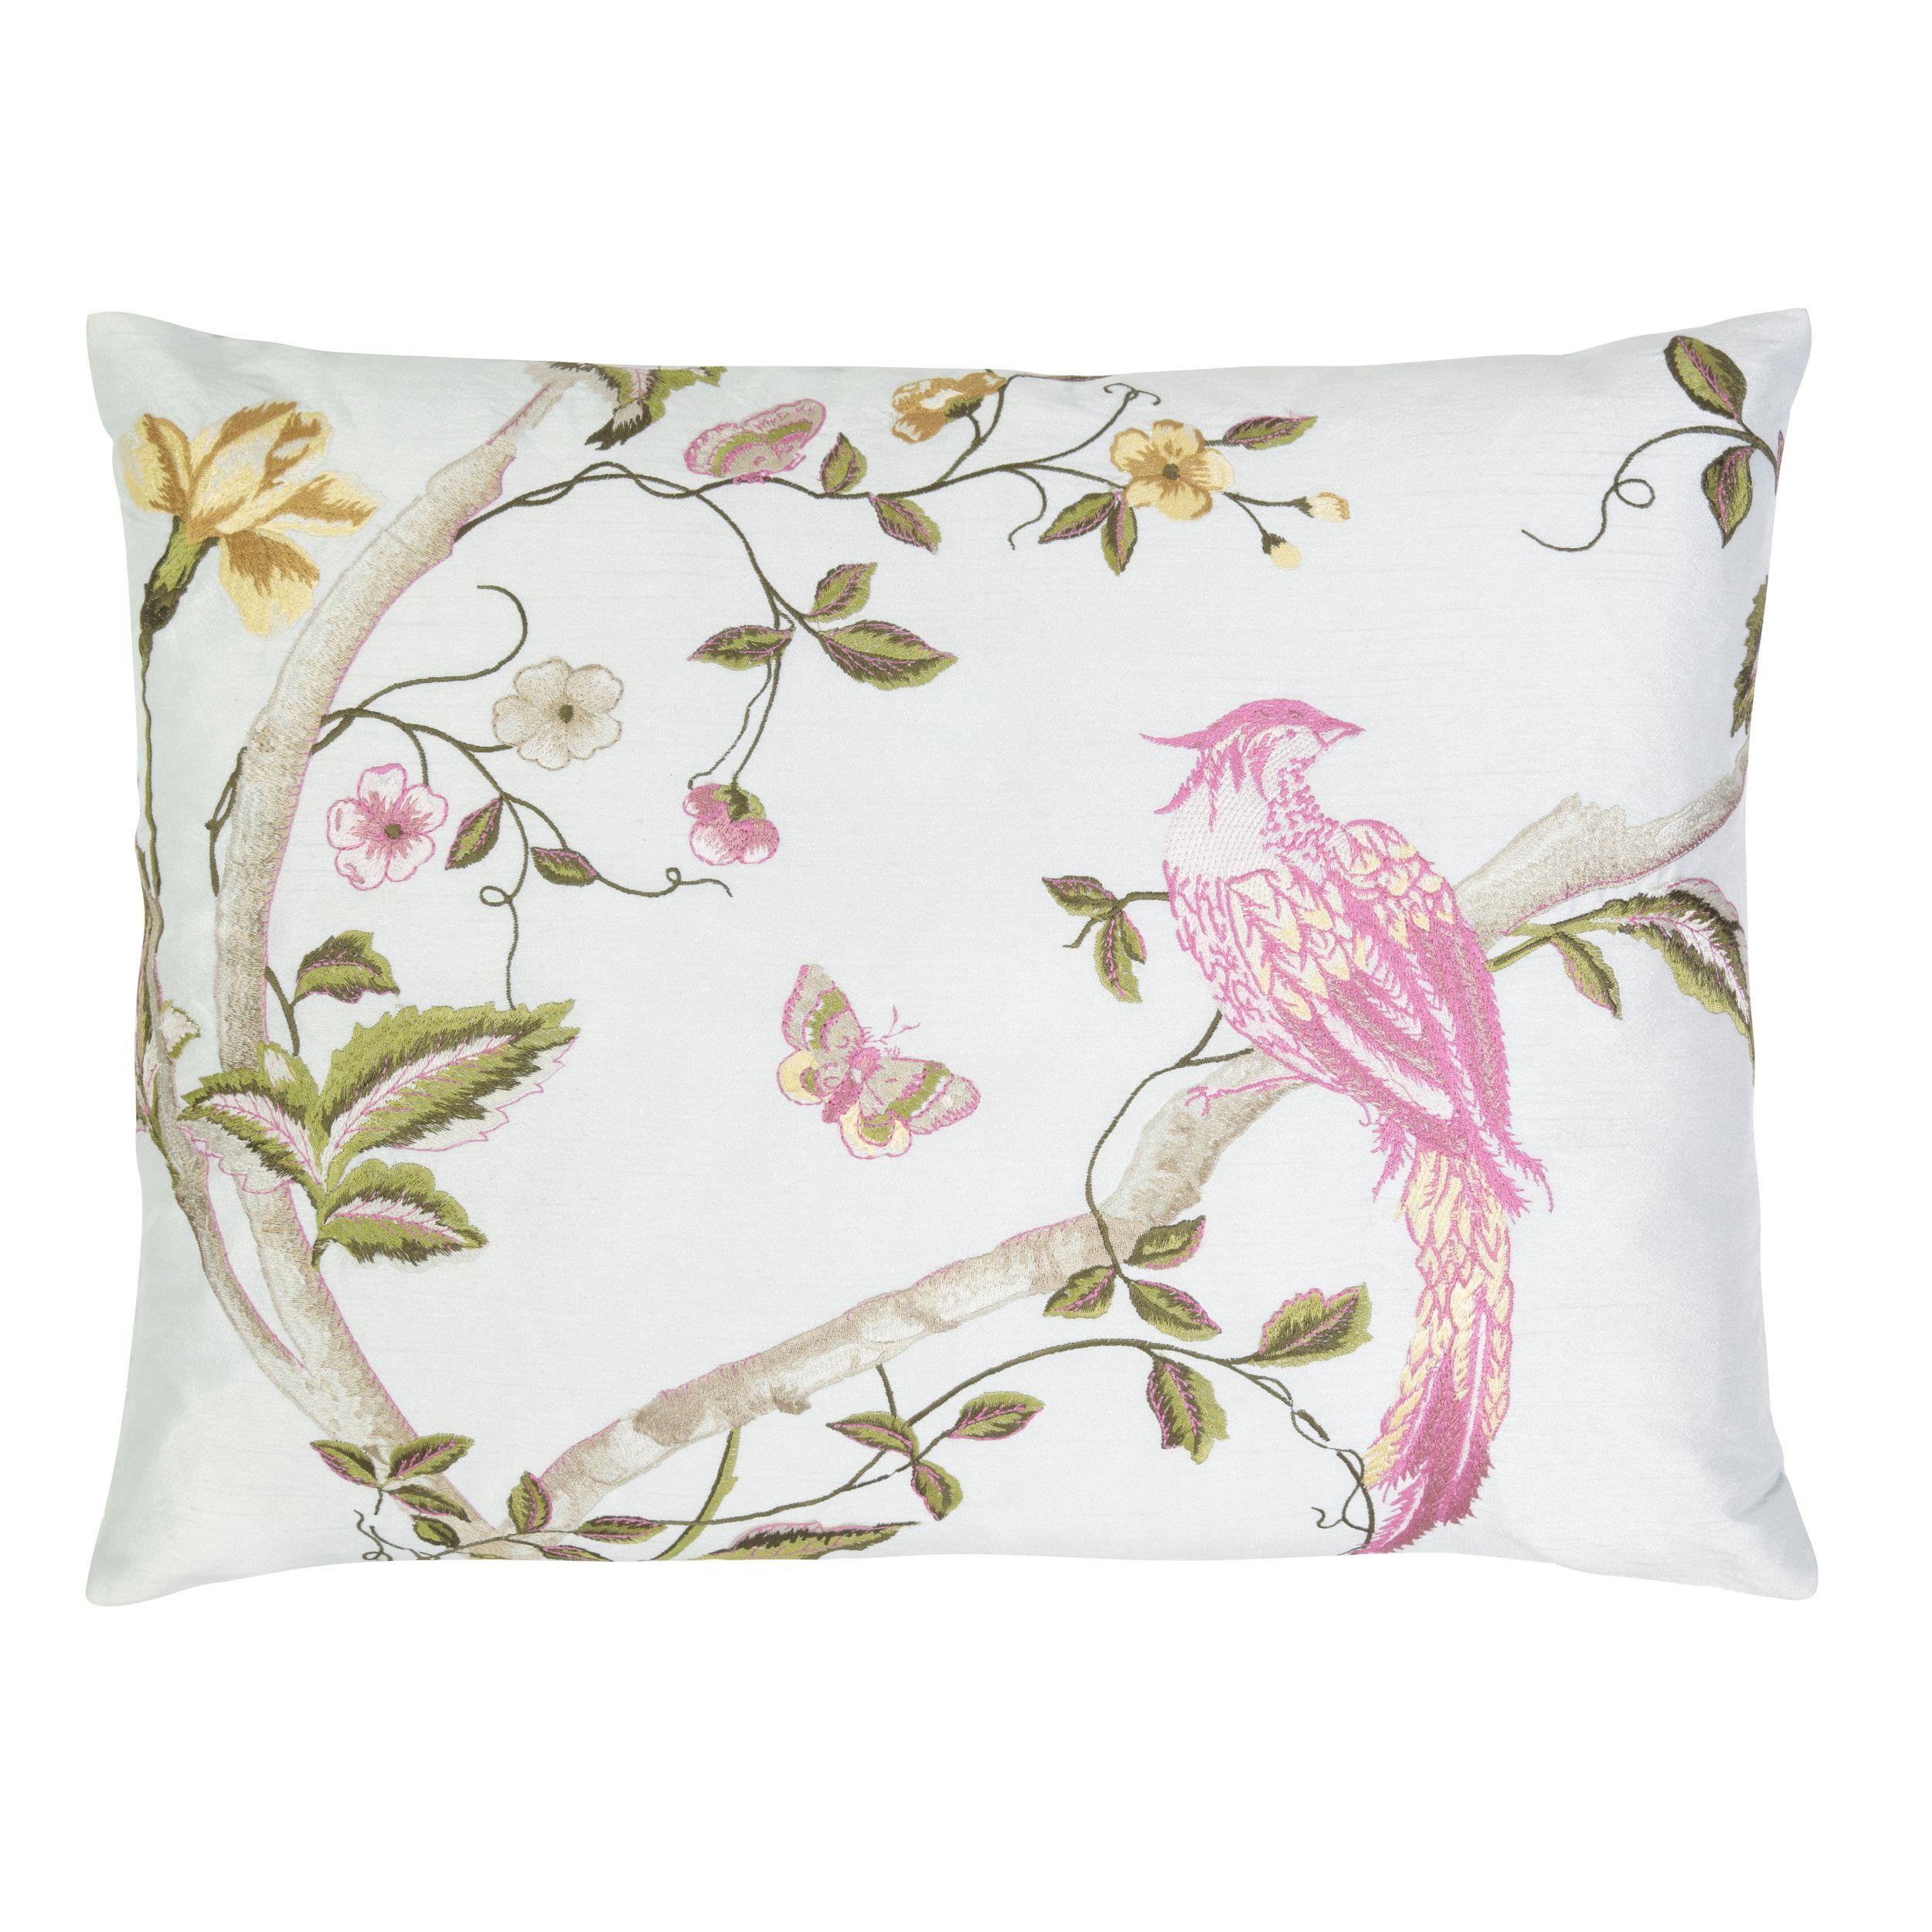 laura ashley summer palace duck egg cushion laura ashley pinterest. Black Bedroom Furniture Sets. Home Design Ideas